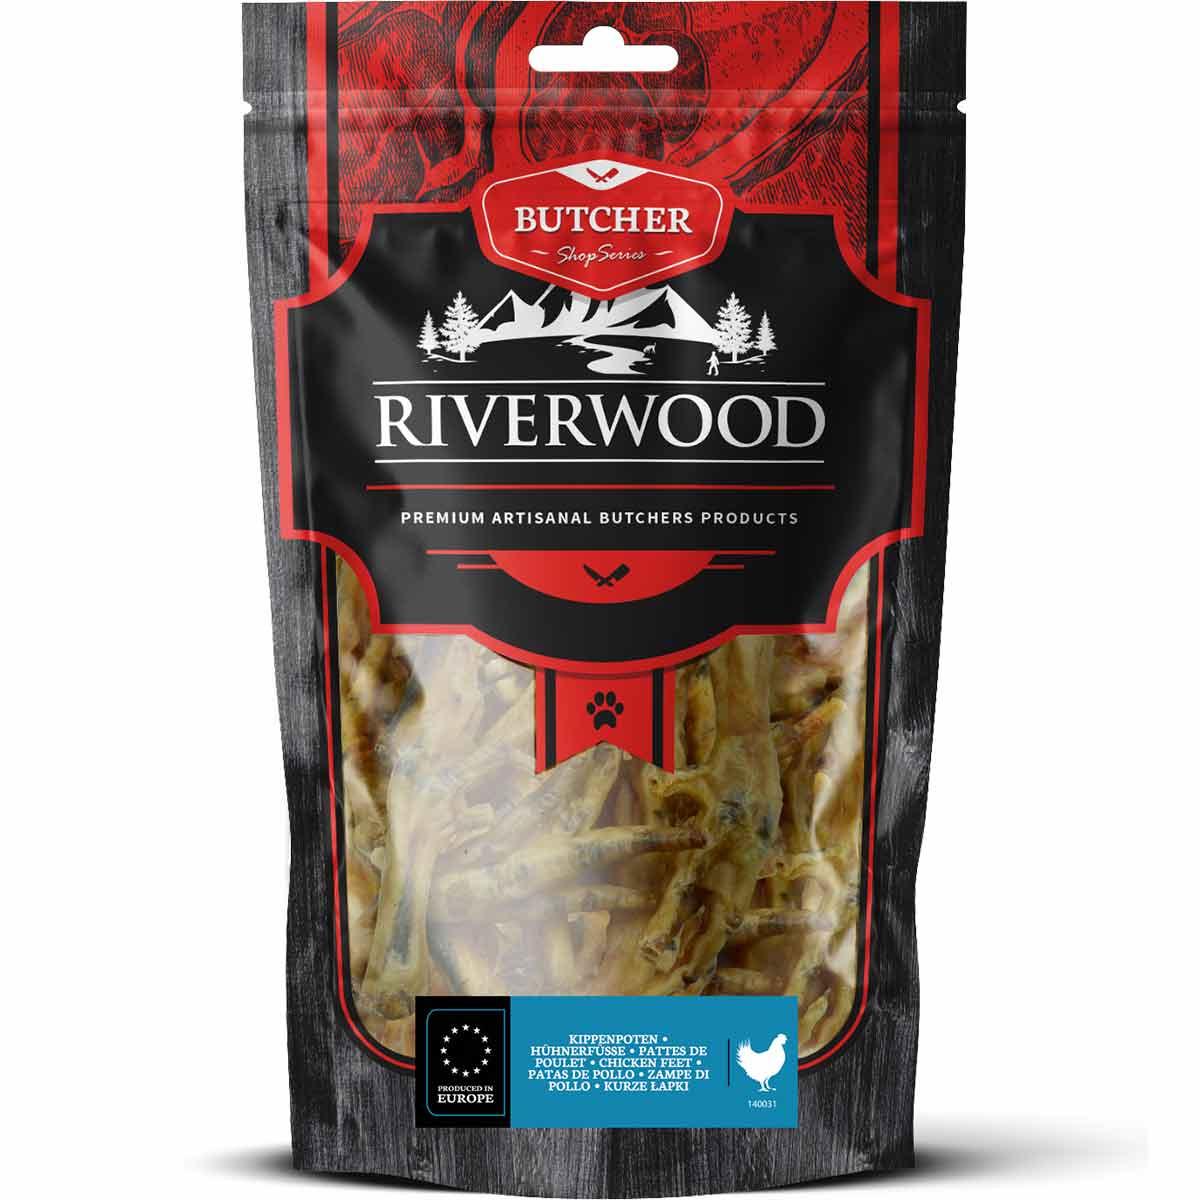 Riverwood Kippenpoten